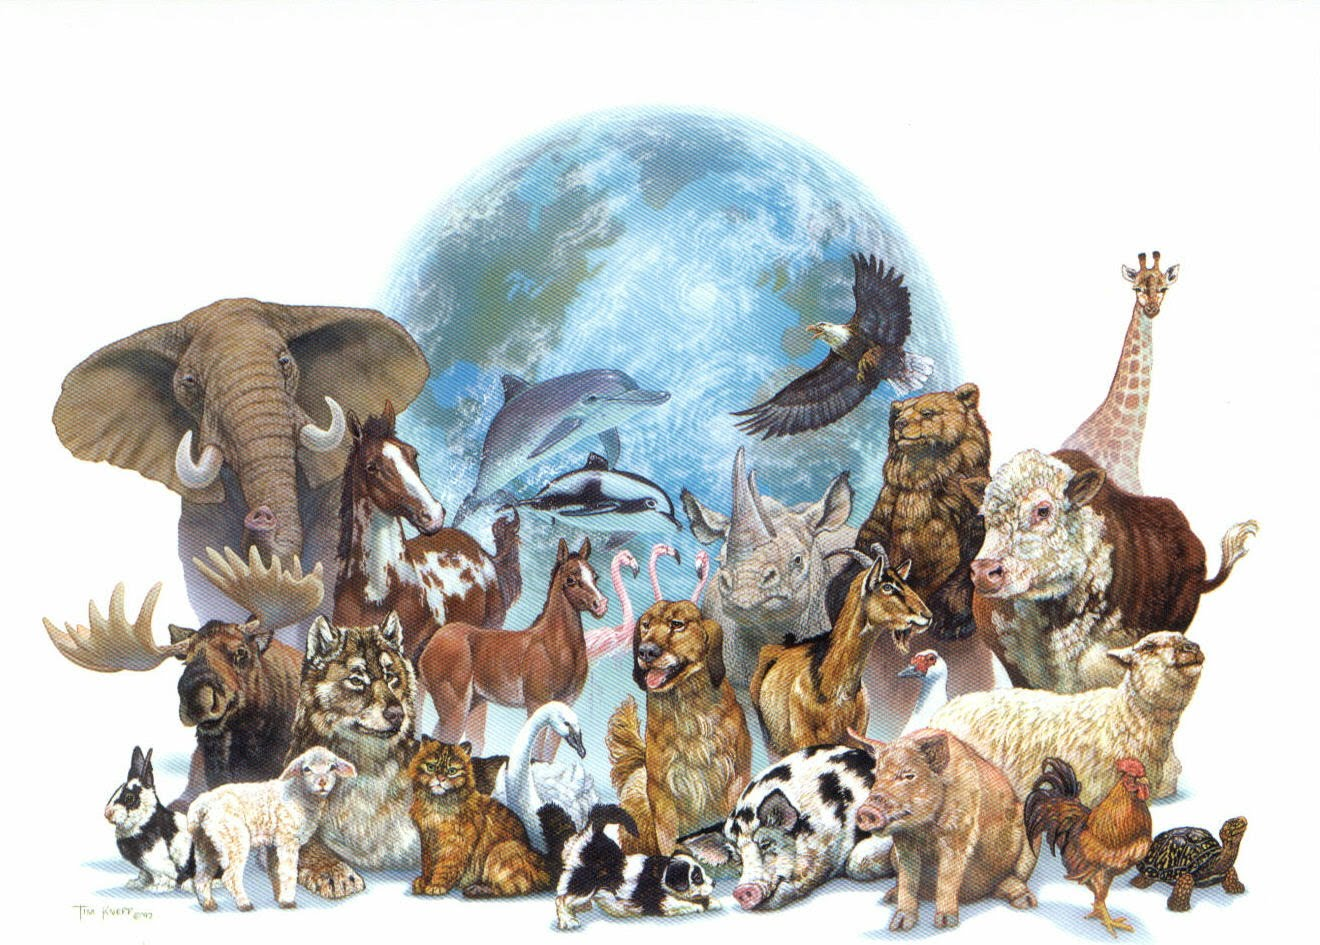 http://2.bp.blogspot.com/_p-c4tck0AqQ/TJIcLuFbnUI/AAAAAAAAABw/4renaHwdL-E/s1600/animal_mural_jpg.jpg